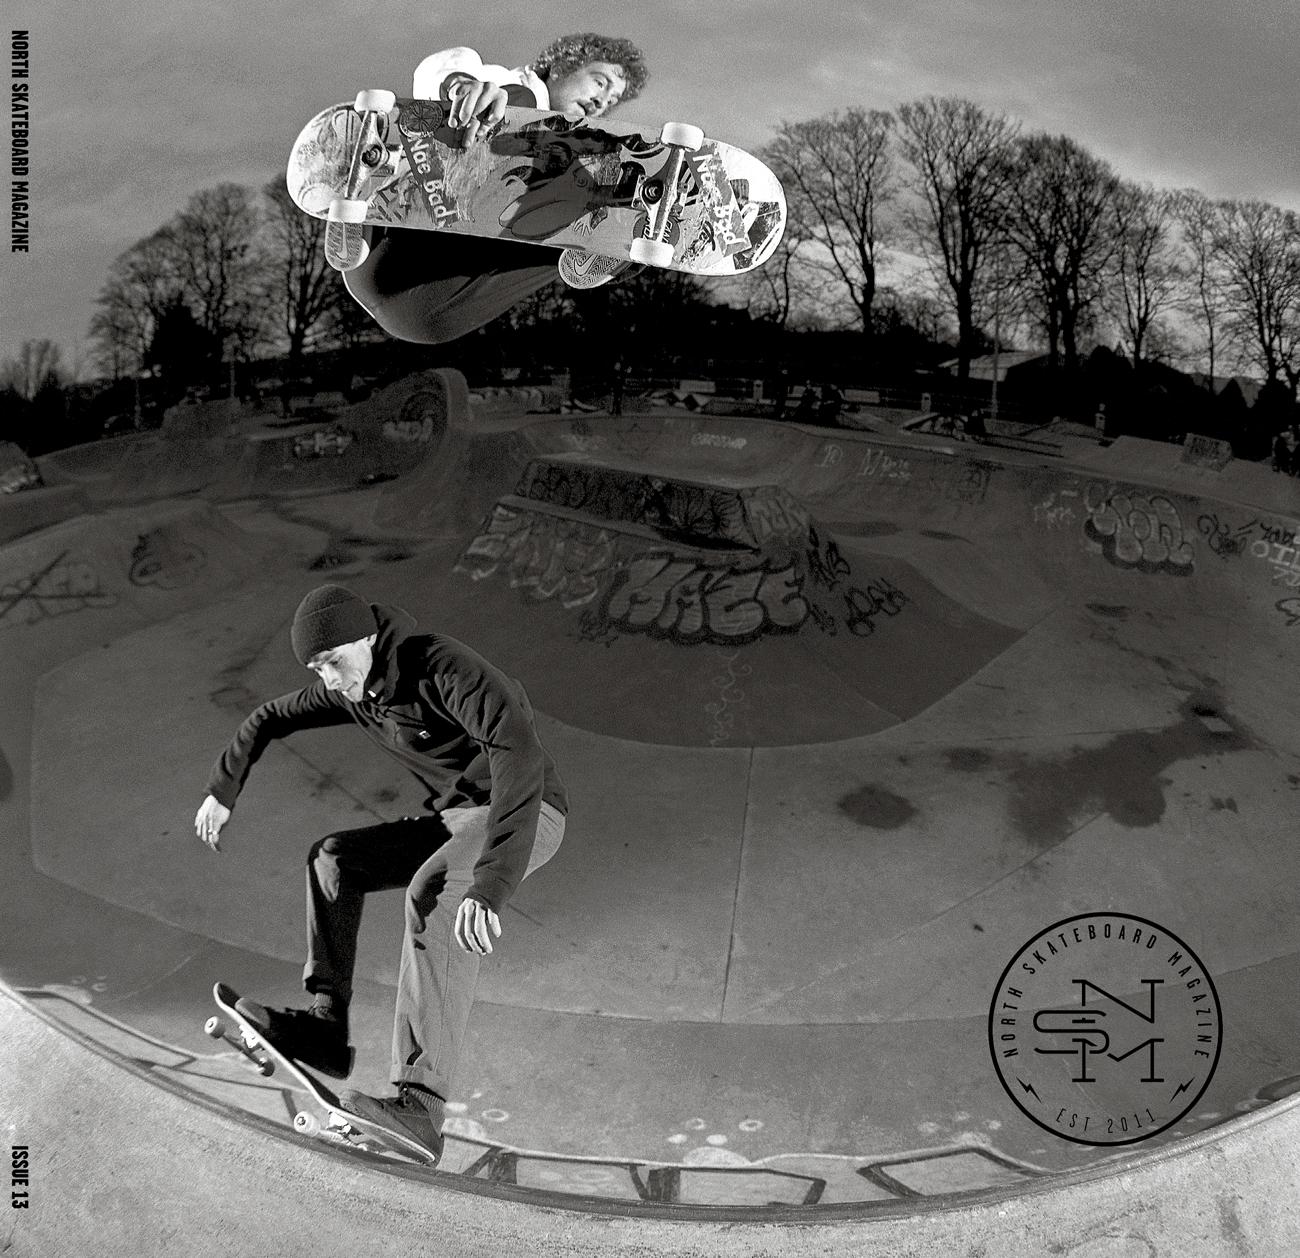 Cover: Kieran Menzies & Daniel Nicholas  Photo: Graham Tait